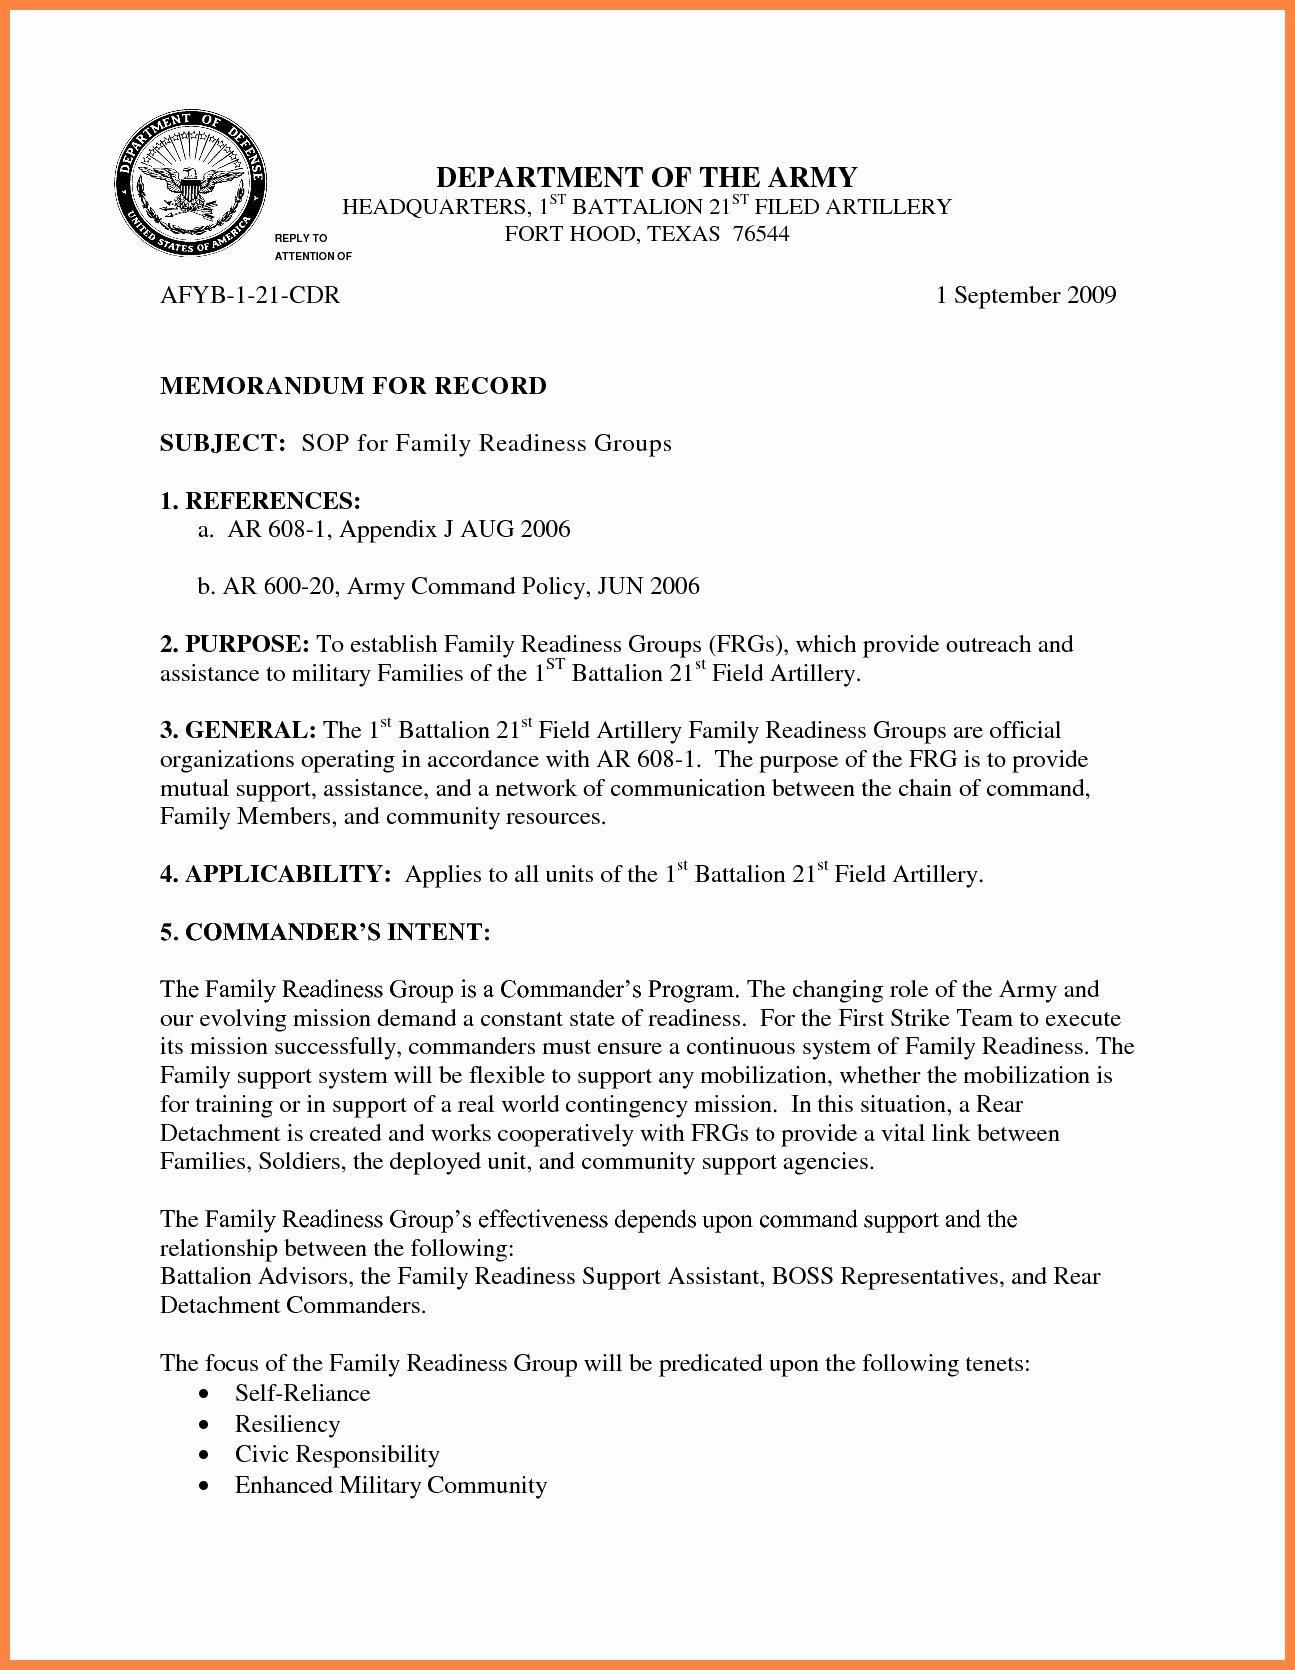 Memorandum format Army